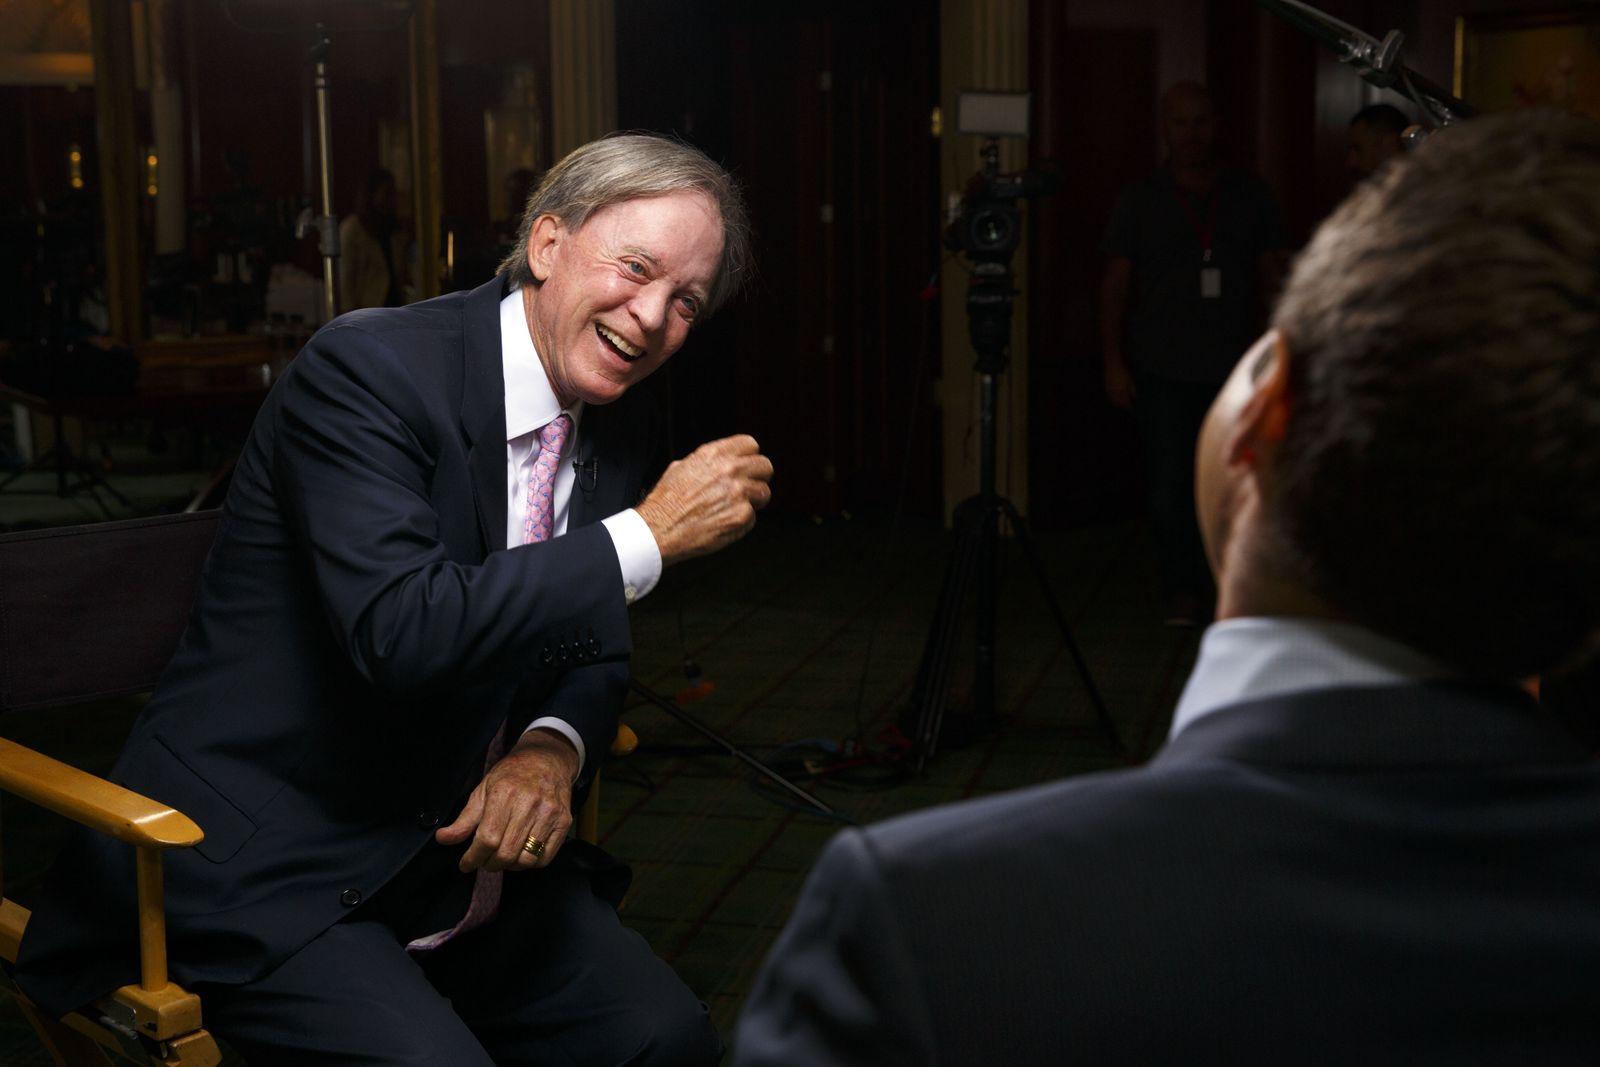 PIMCO Co-Founder Bill Gross Interview